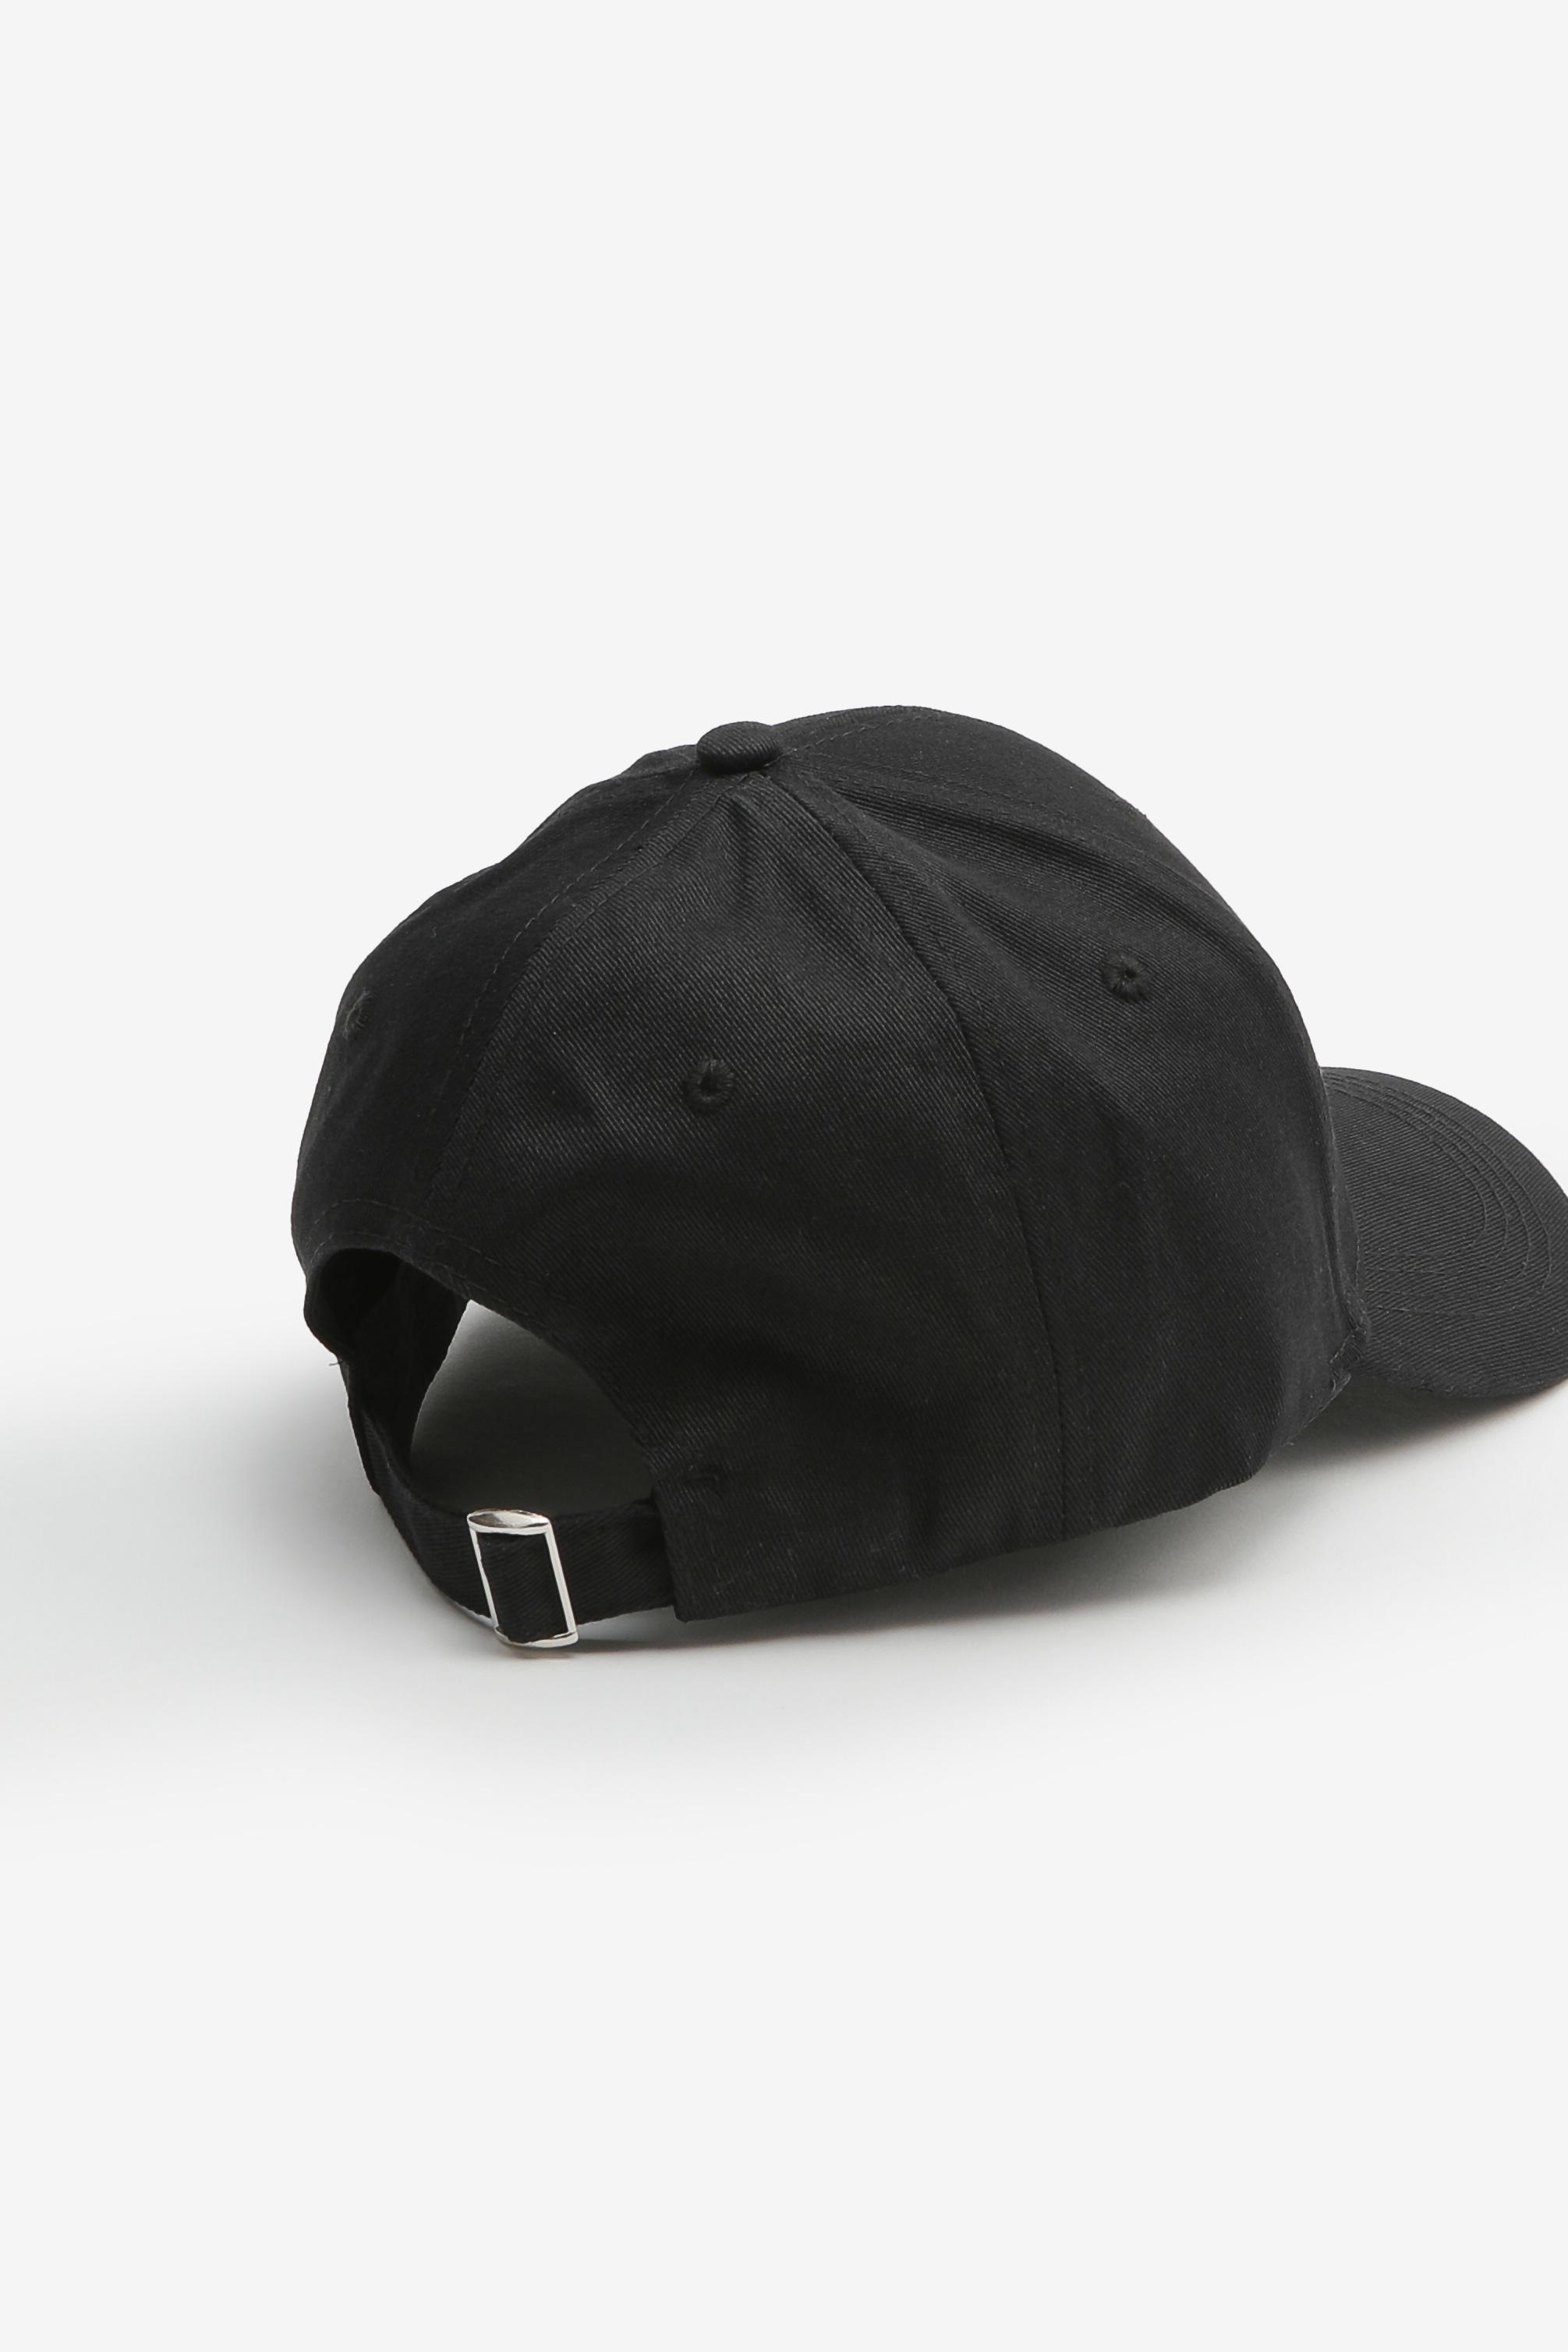 Express Yourself Baseball Cap